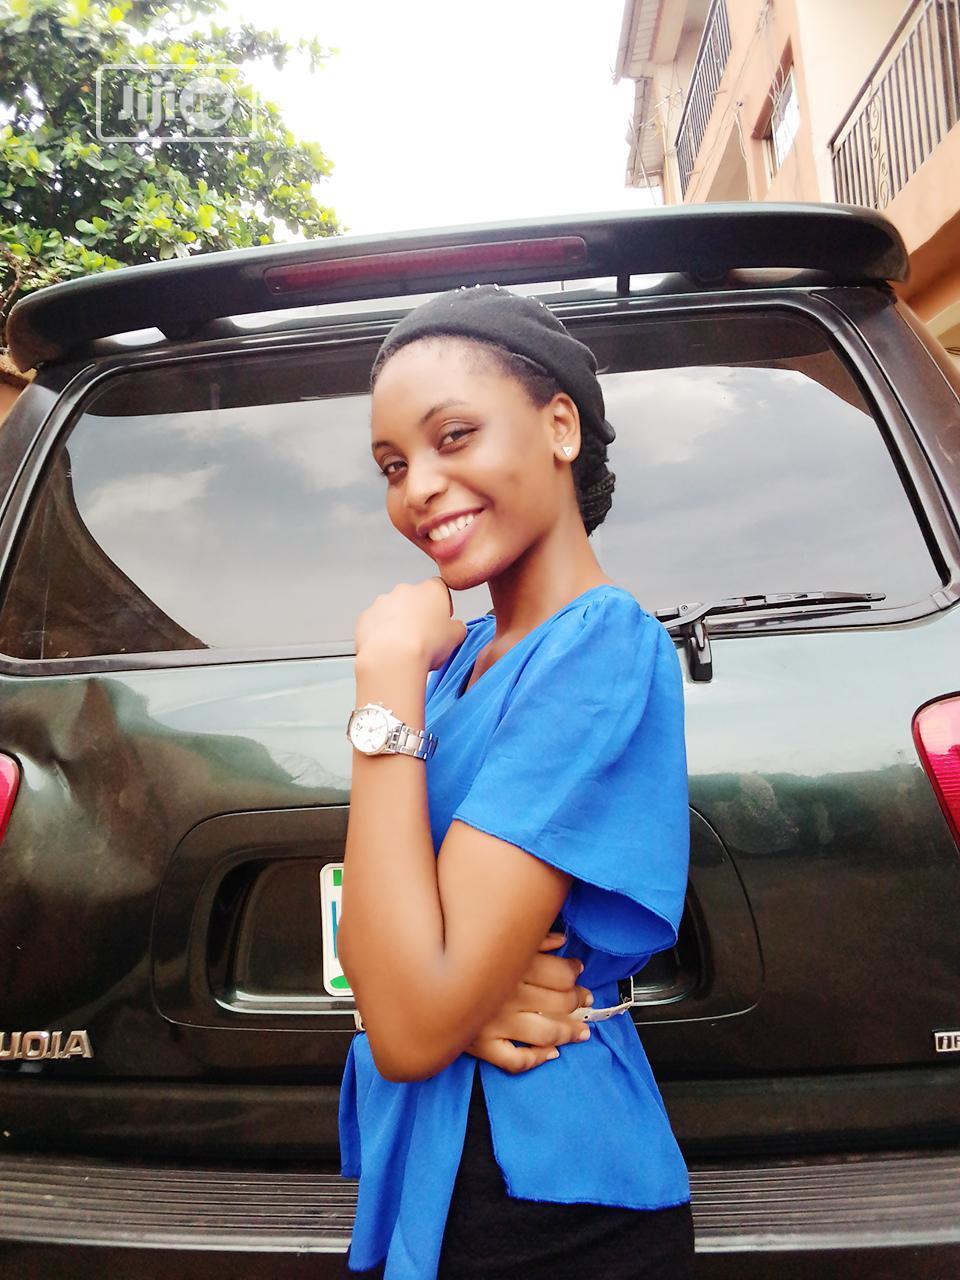 Ushering Job In Ikeja Part Time Weekend Cvs Oluwasanya Blessing Jiji Ng Resume From Oluwasanya Blessing In Ikeja Cv For Part Time And Weekend Job Position On Jiji Ng